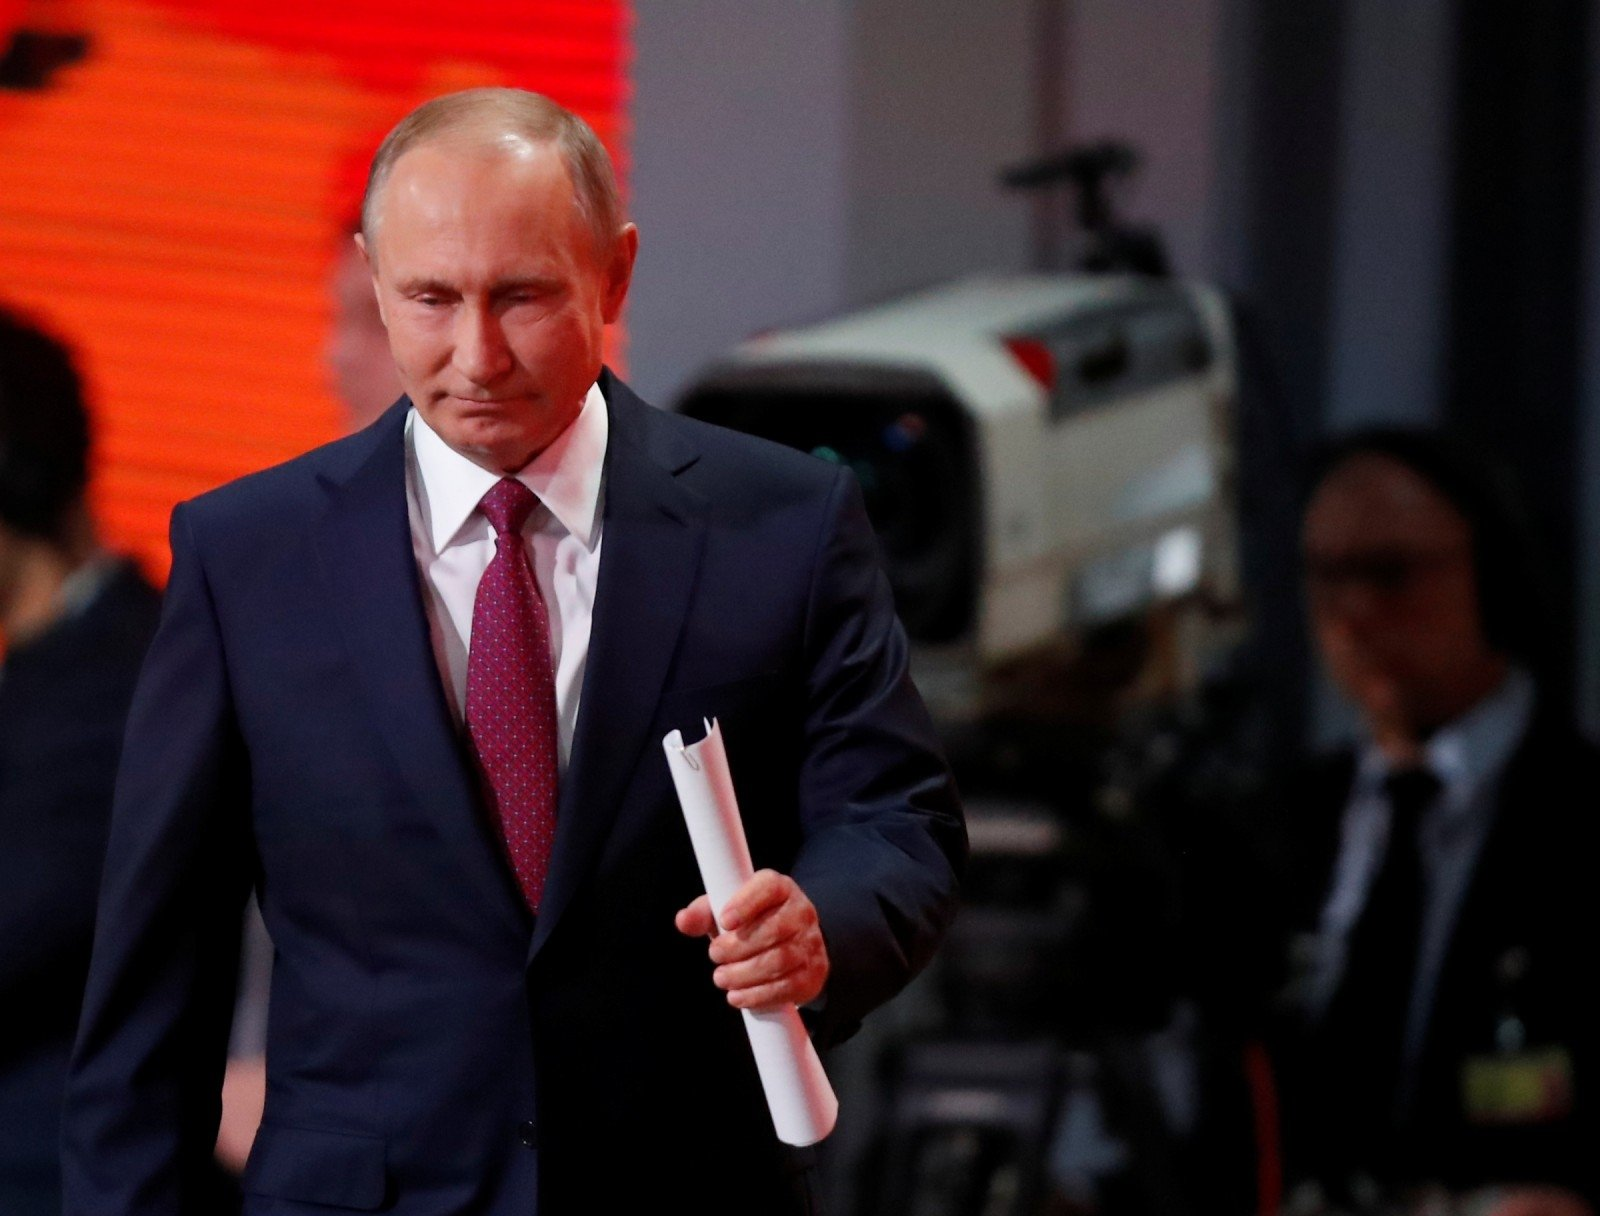 Гендиректор «КамАЗа» Когогин стал сопредседателем предвыборного штаба В. Путина